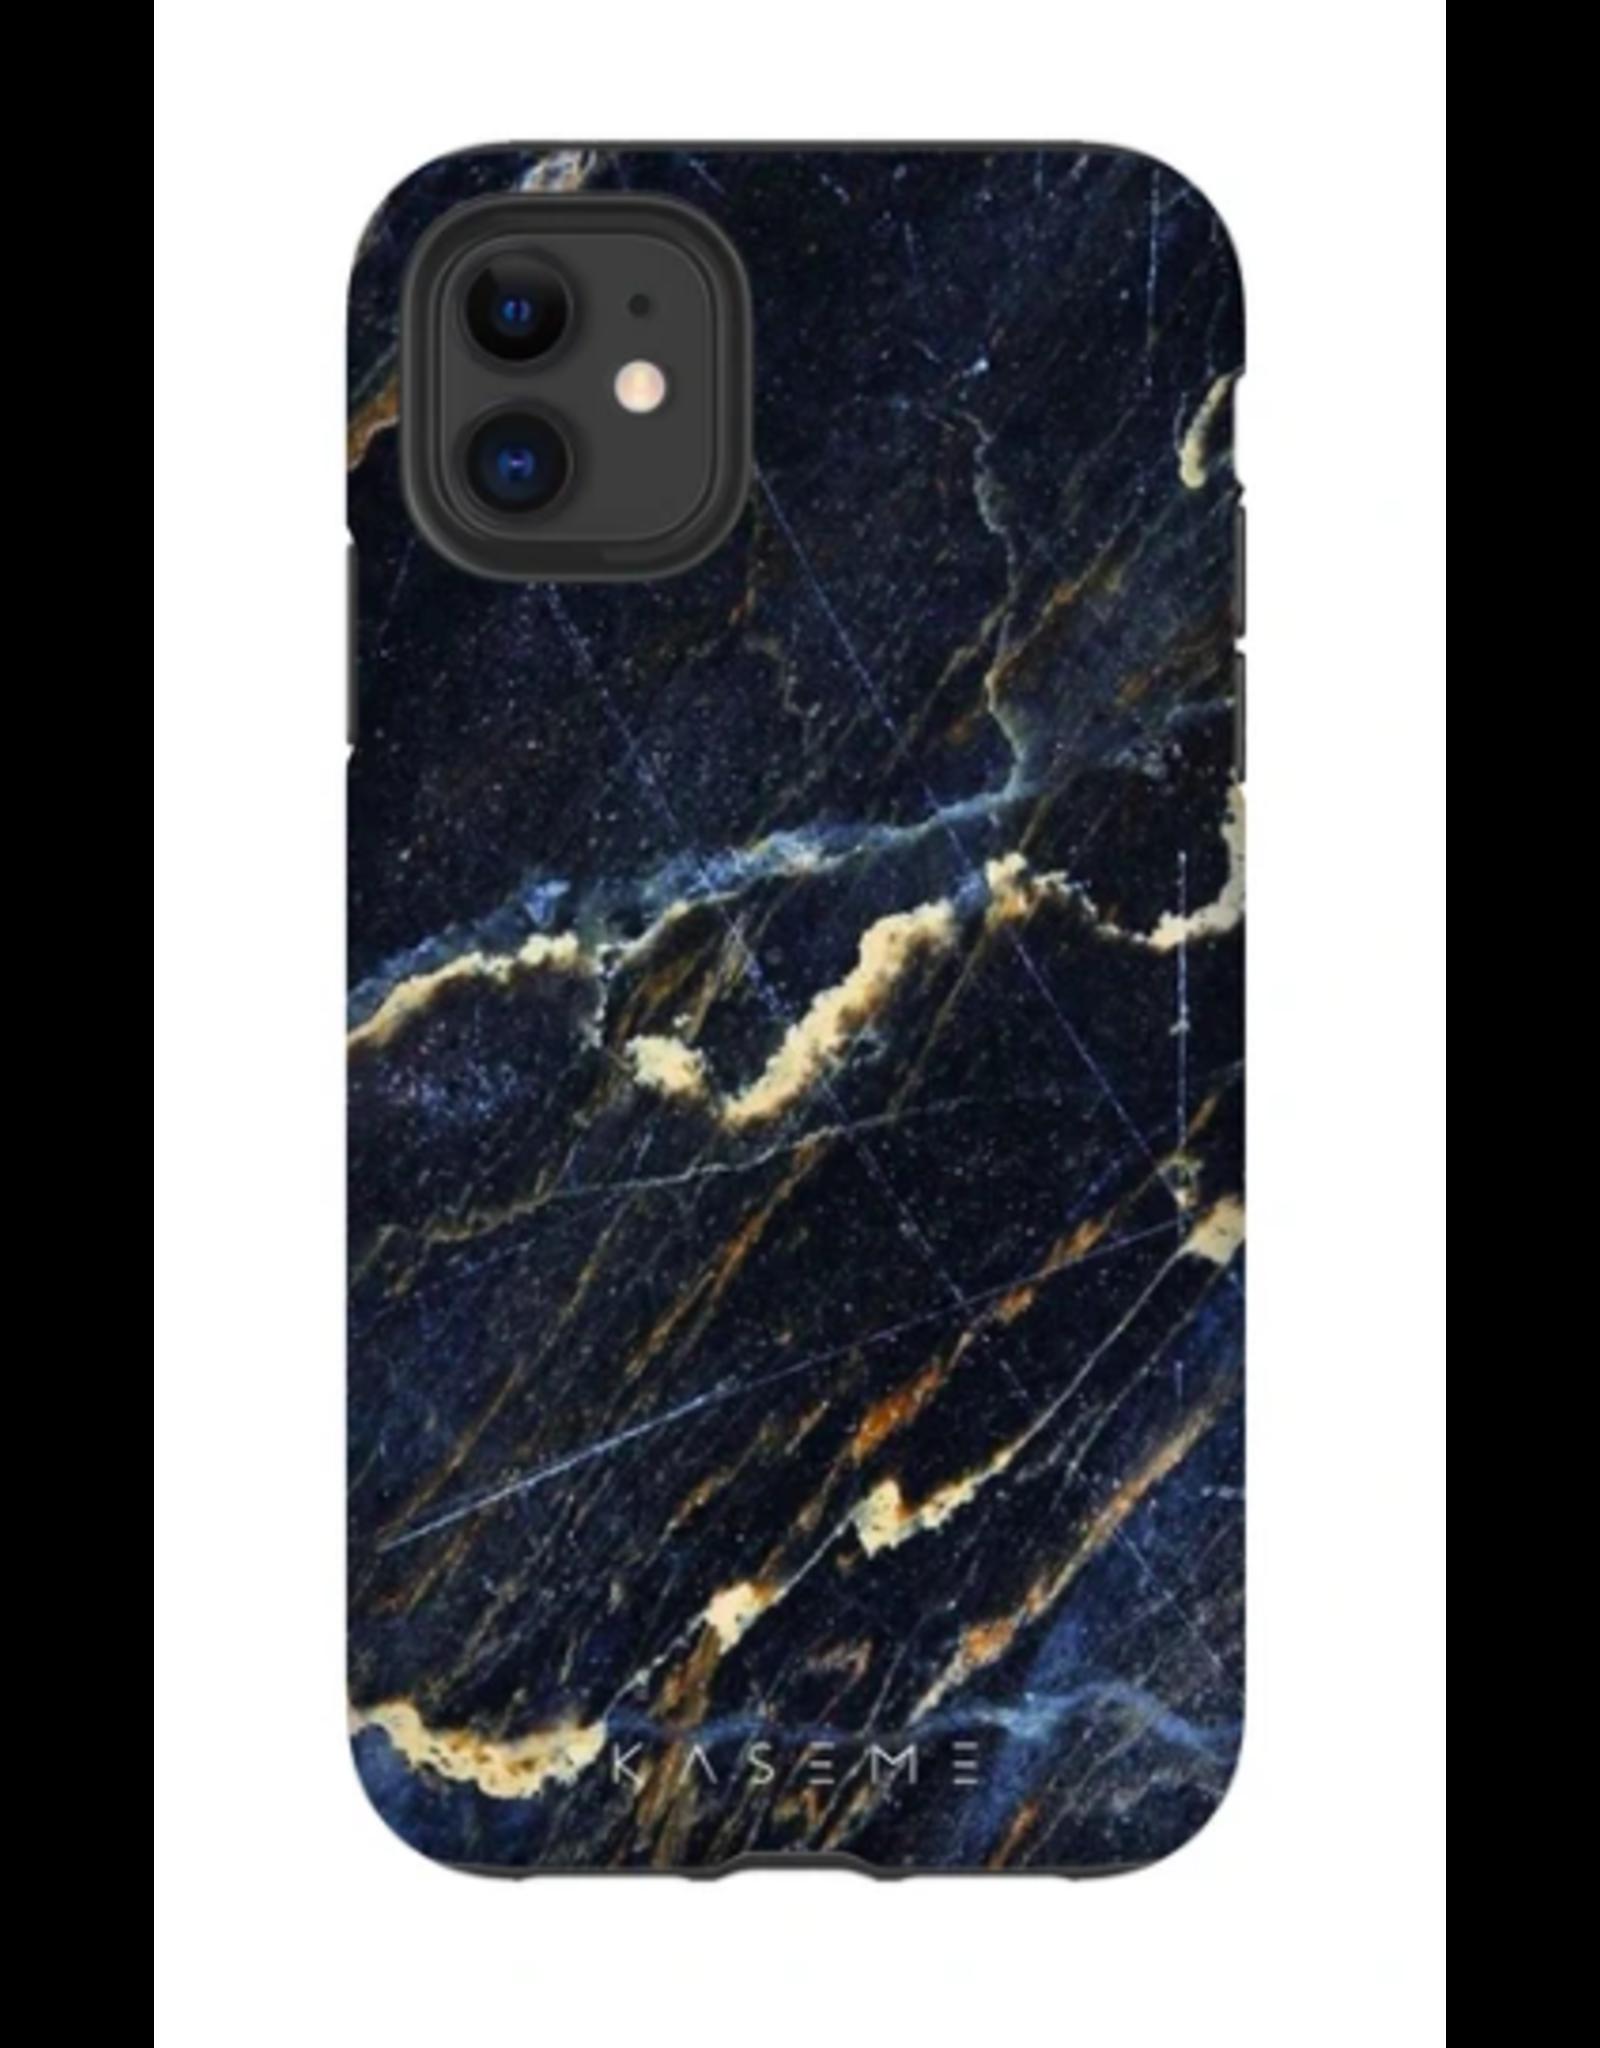 Kaseme Kaseme -Etui cellulaire iPhone mystic